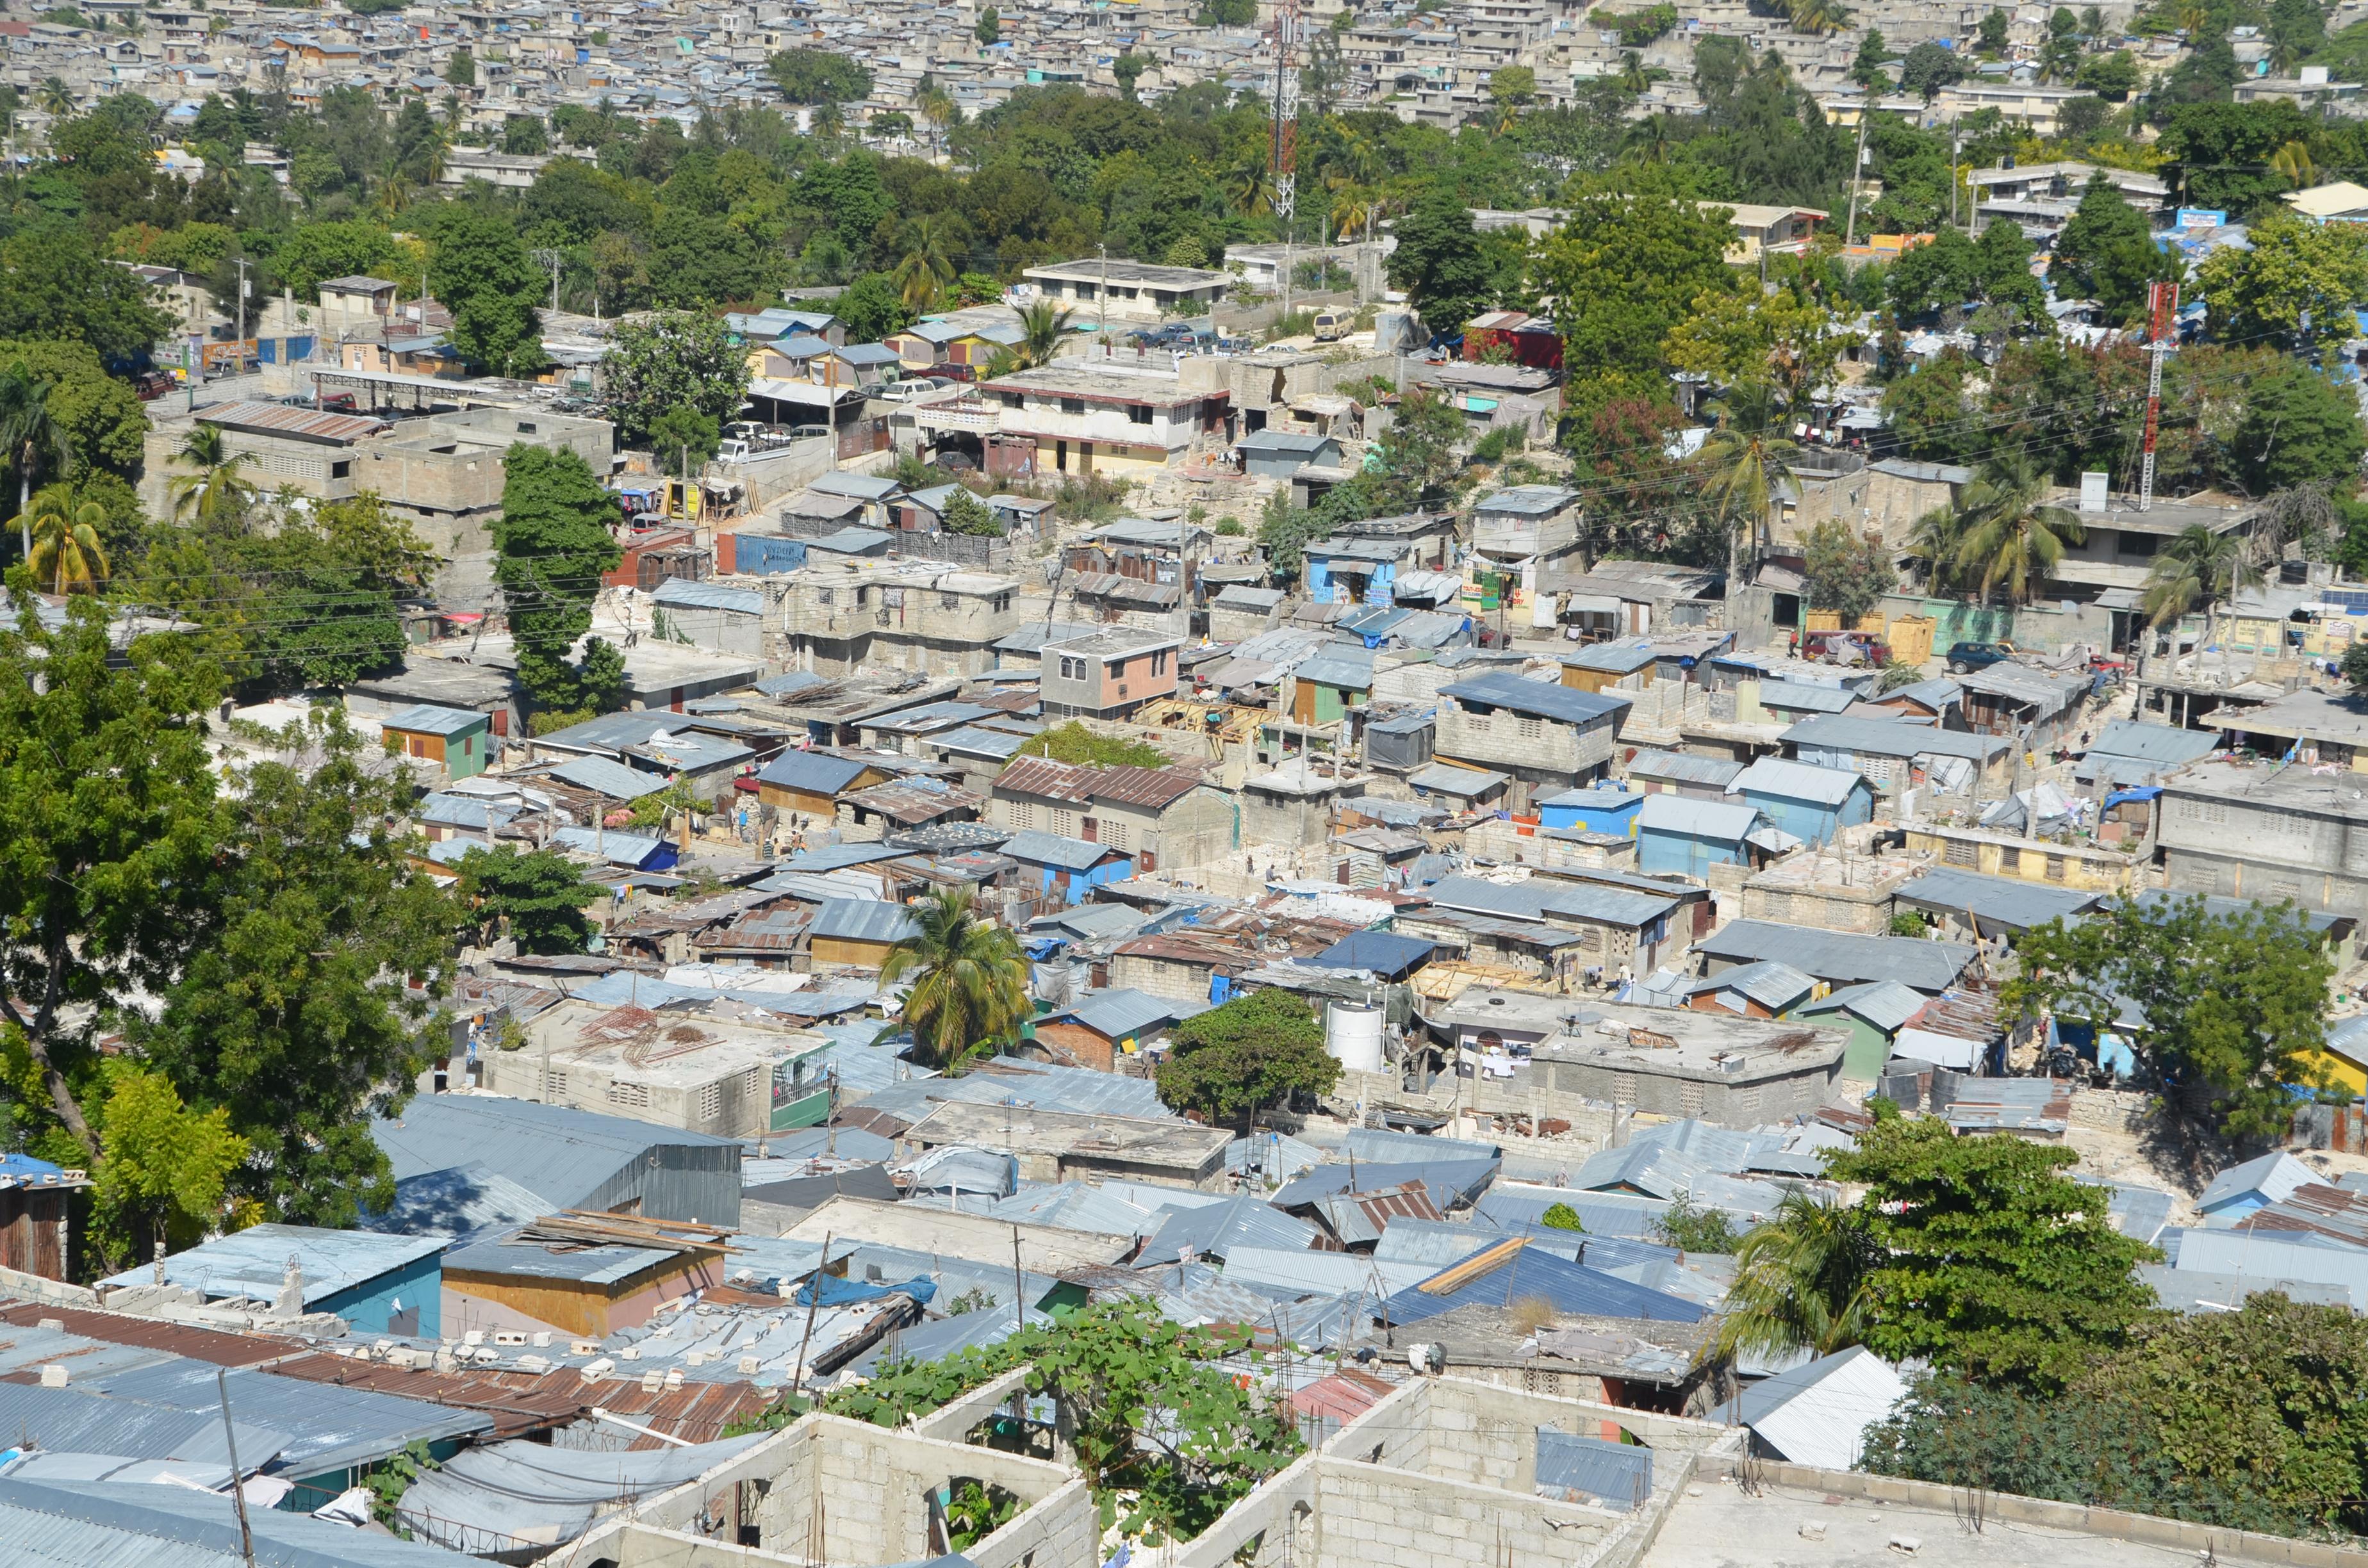 2013 Port au Prince rebuilt